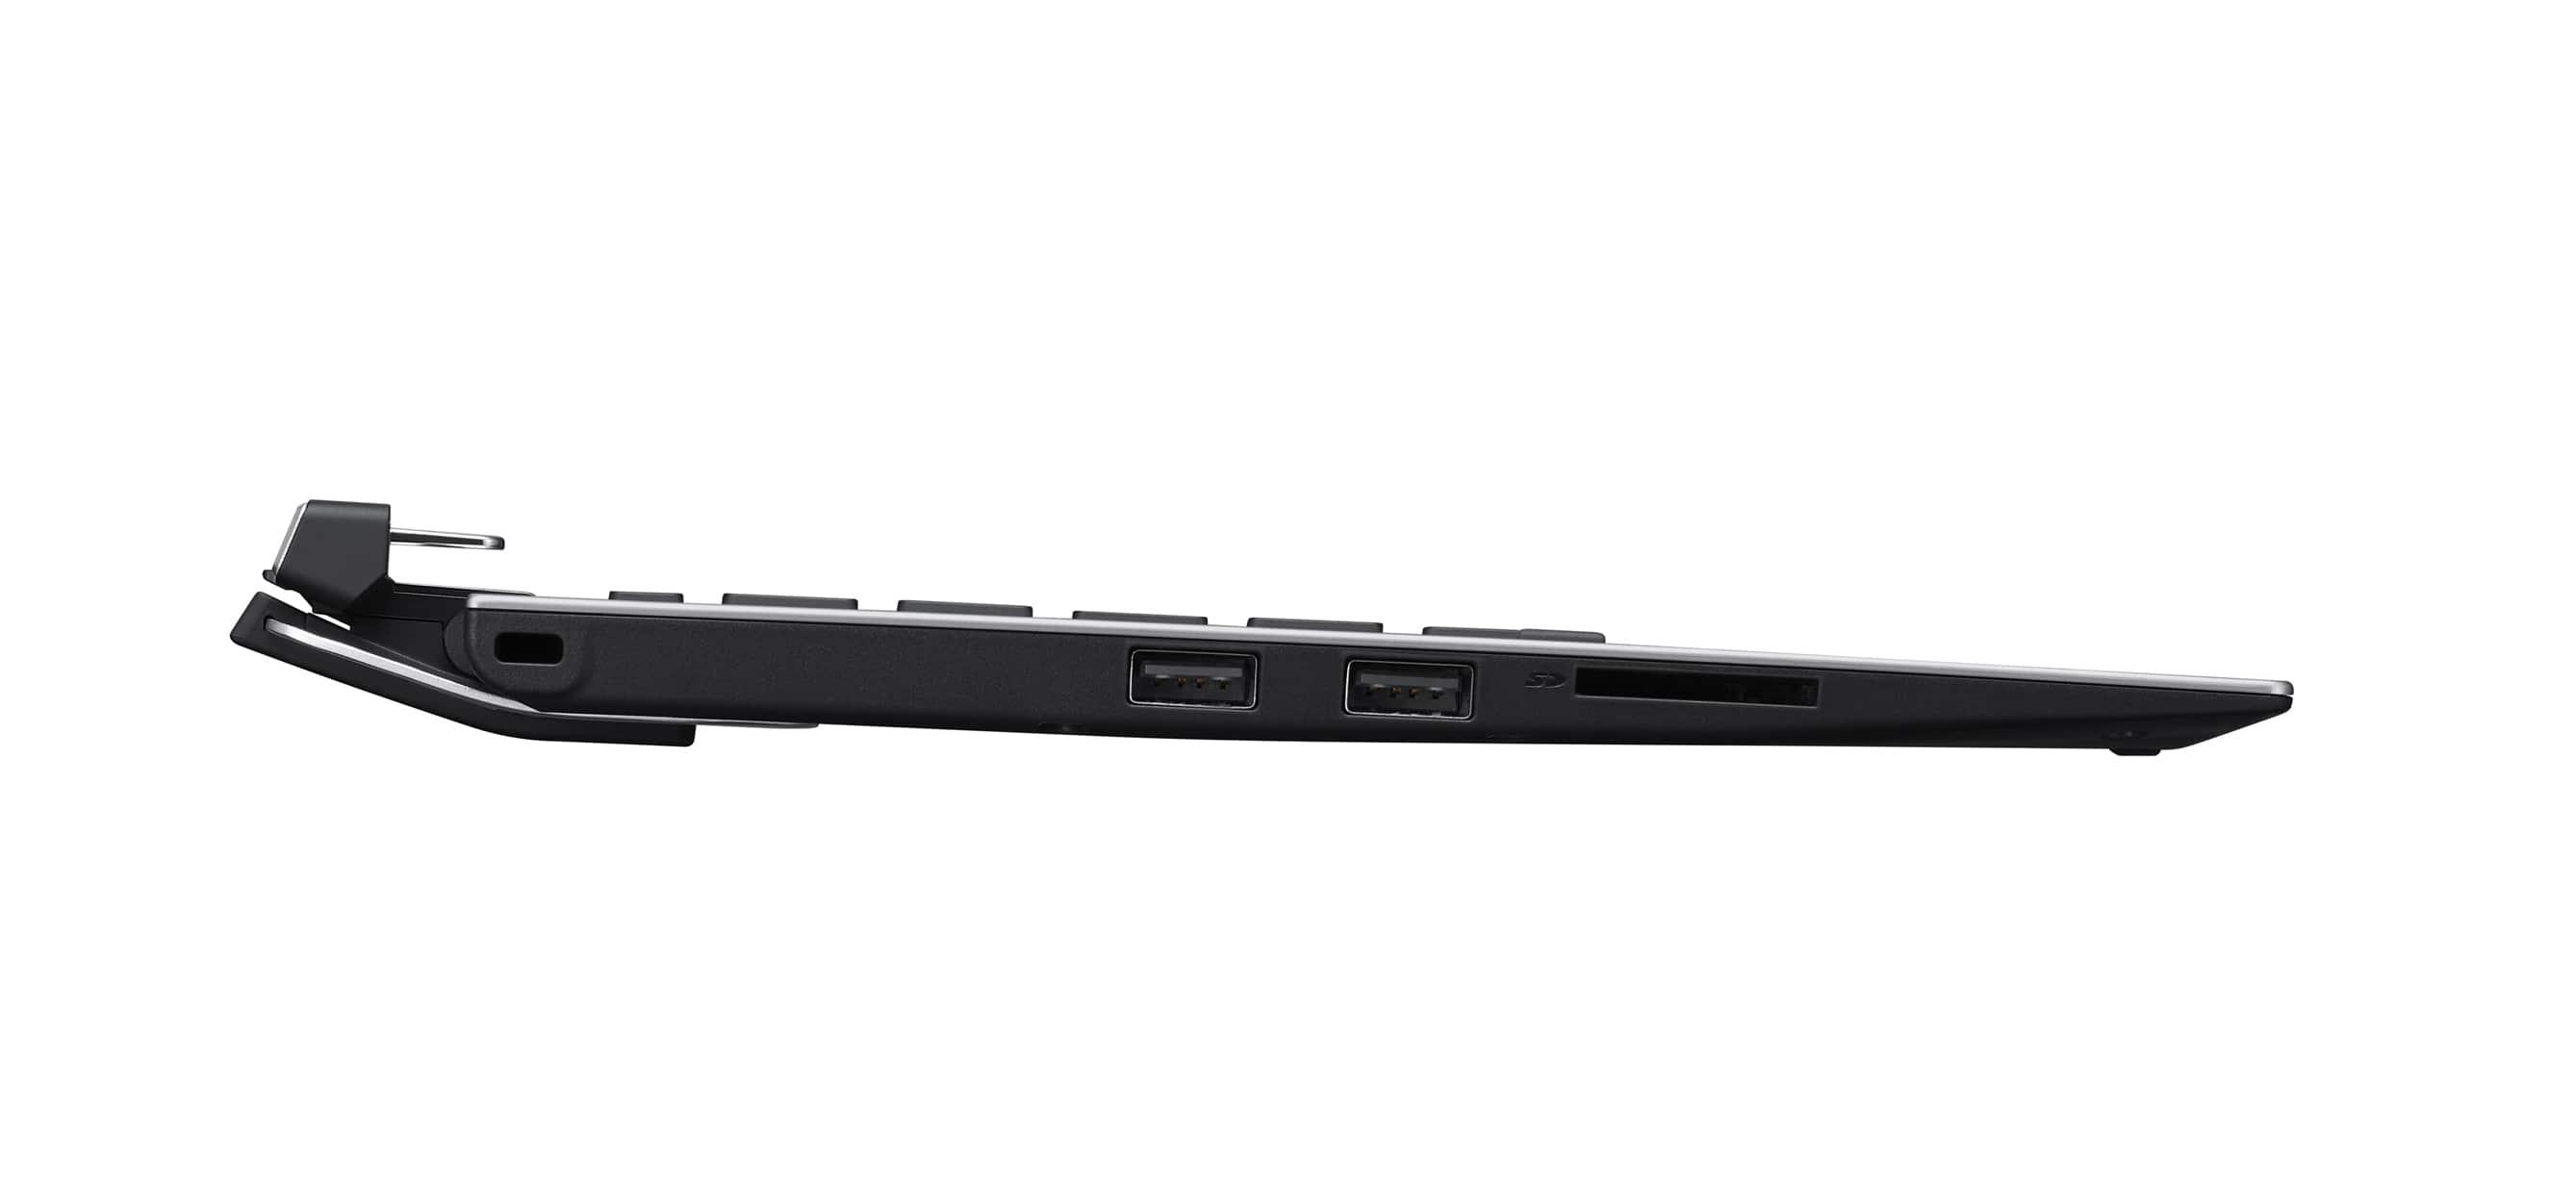 VAIO A12専用 ワイヤレス機能搭載キーボードユニット シルバー/VJ8WKB2